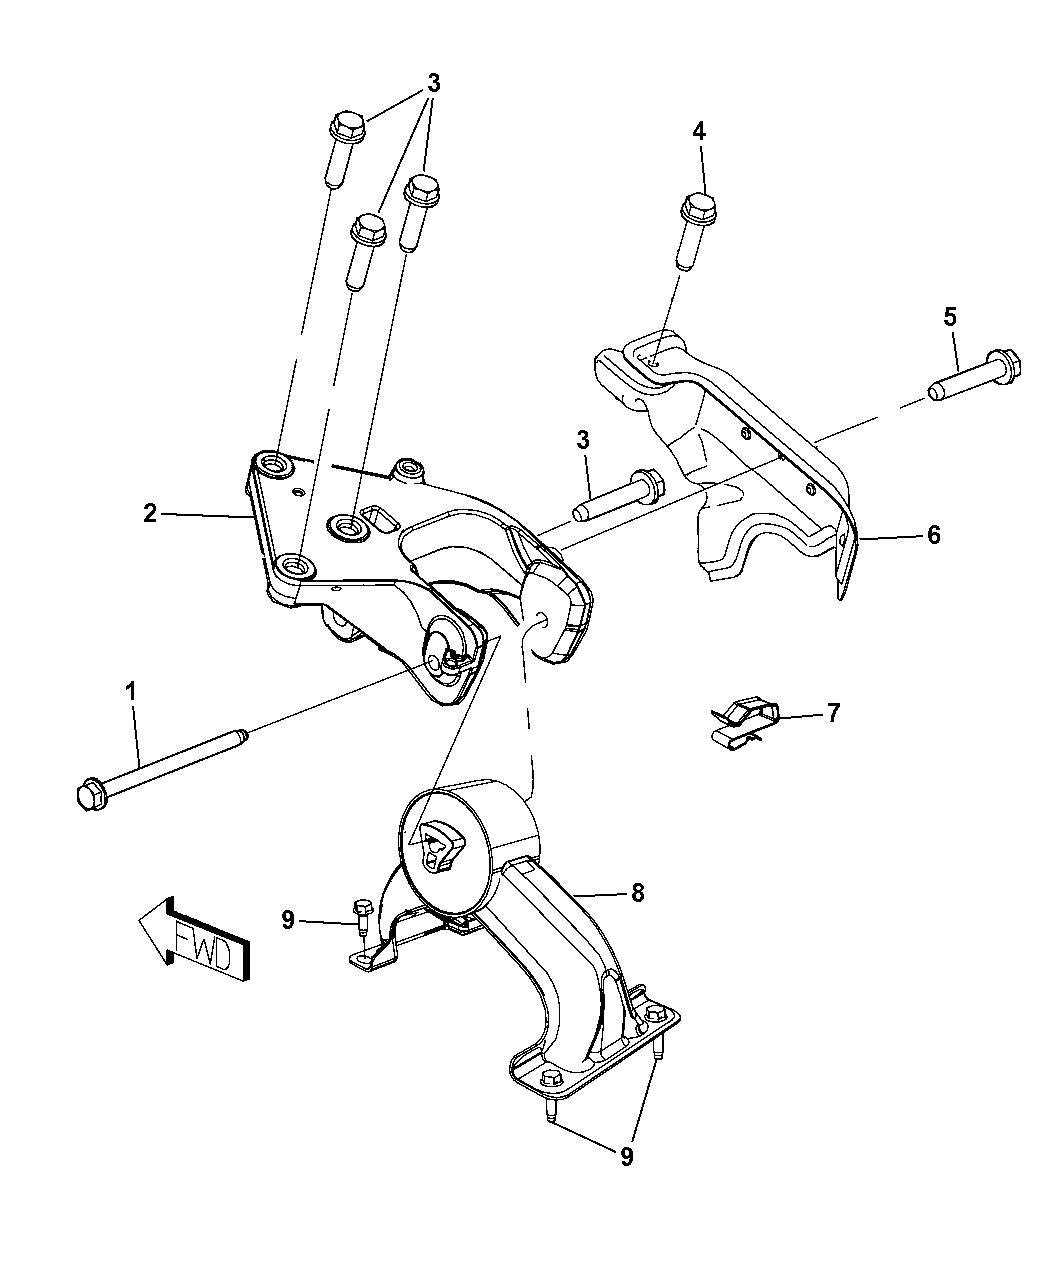 5273893ae genuine chrysler support engine mount rh moparpartsgiant com xc90 engine mount diagram peugeot 206 engine mount diagram